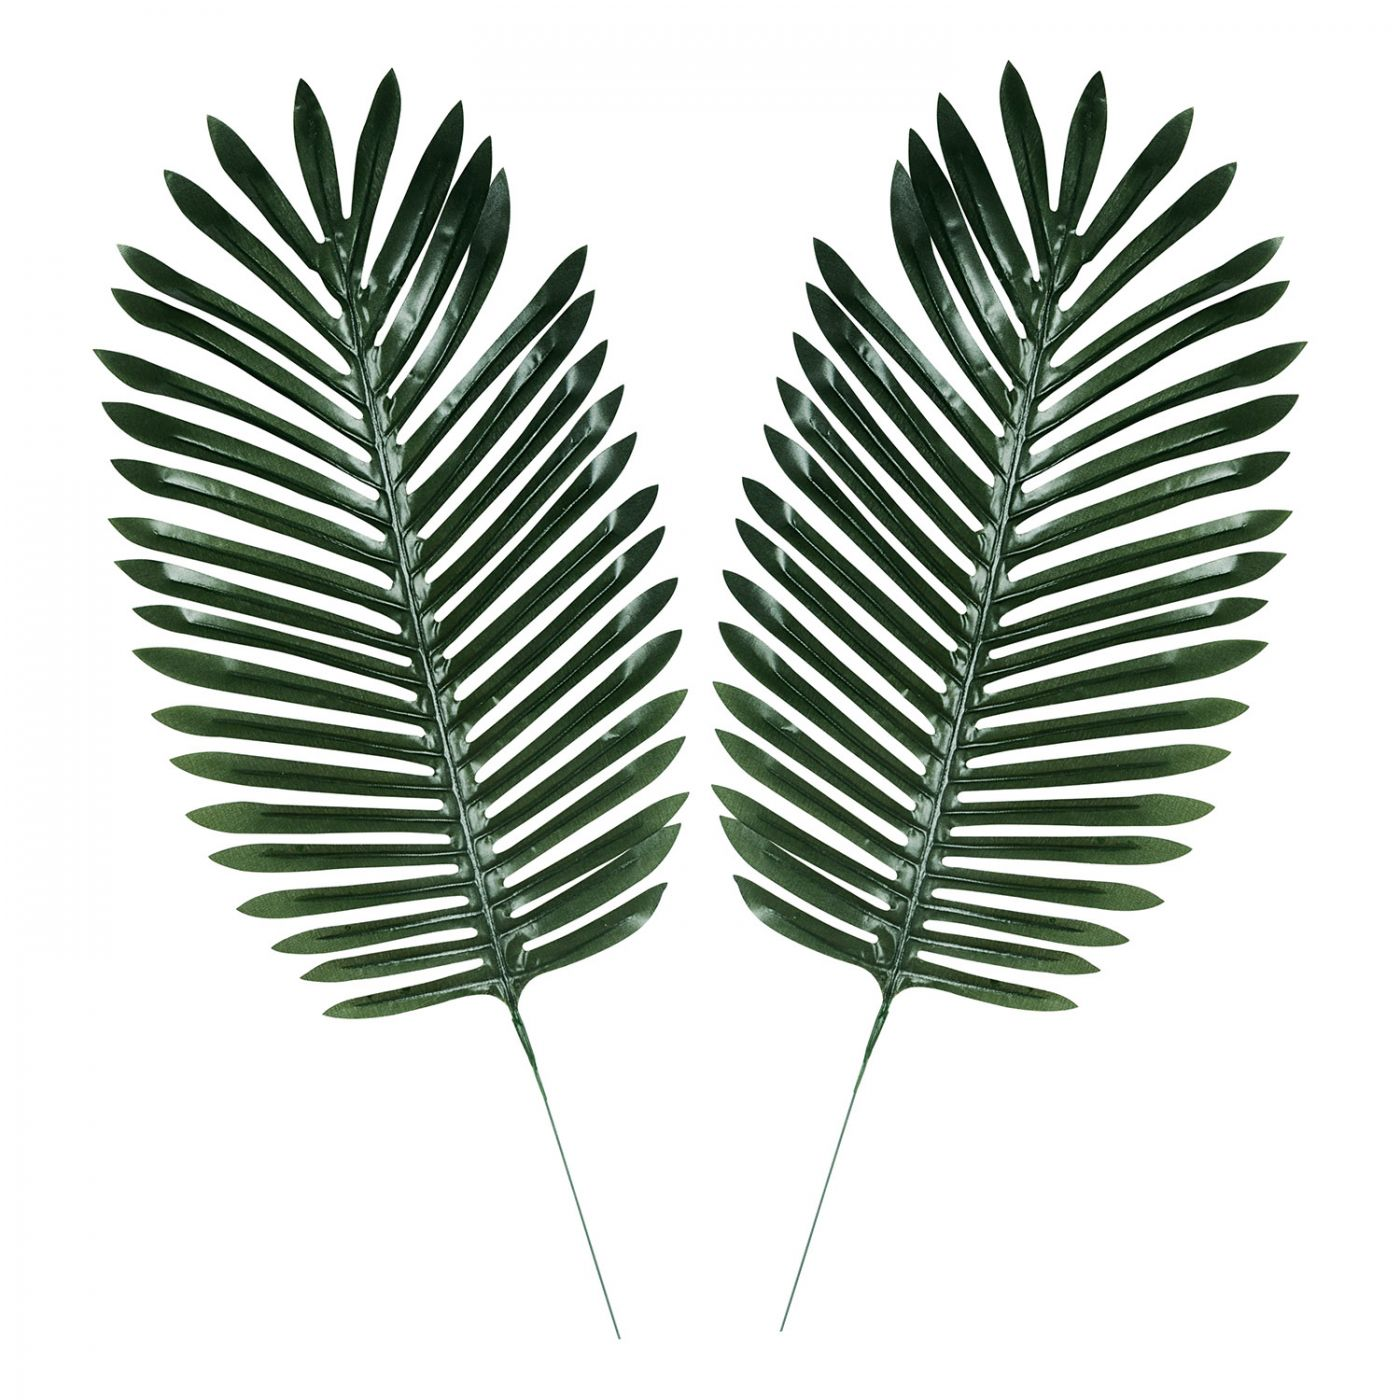 Fabric Fern Palm Leaves image